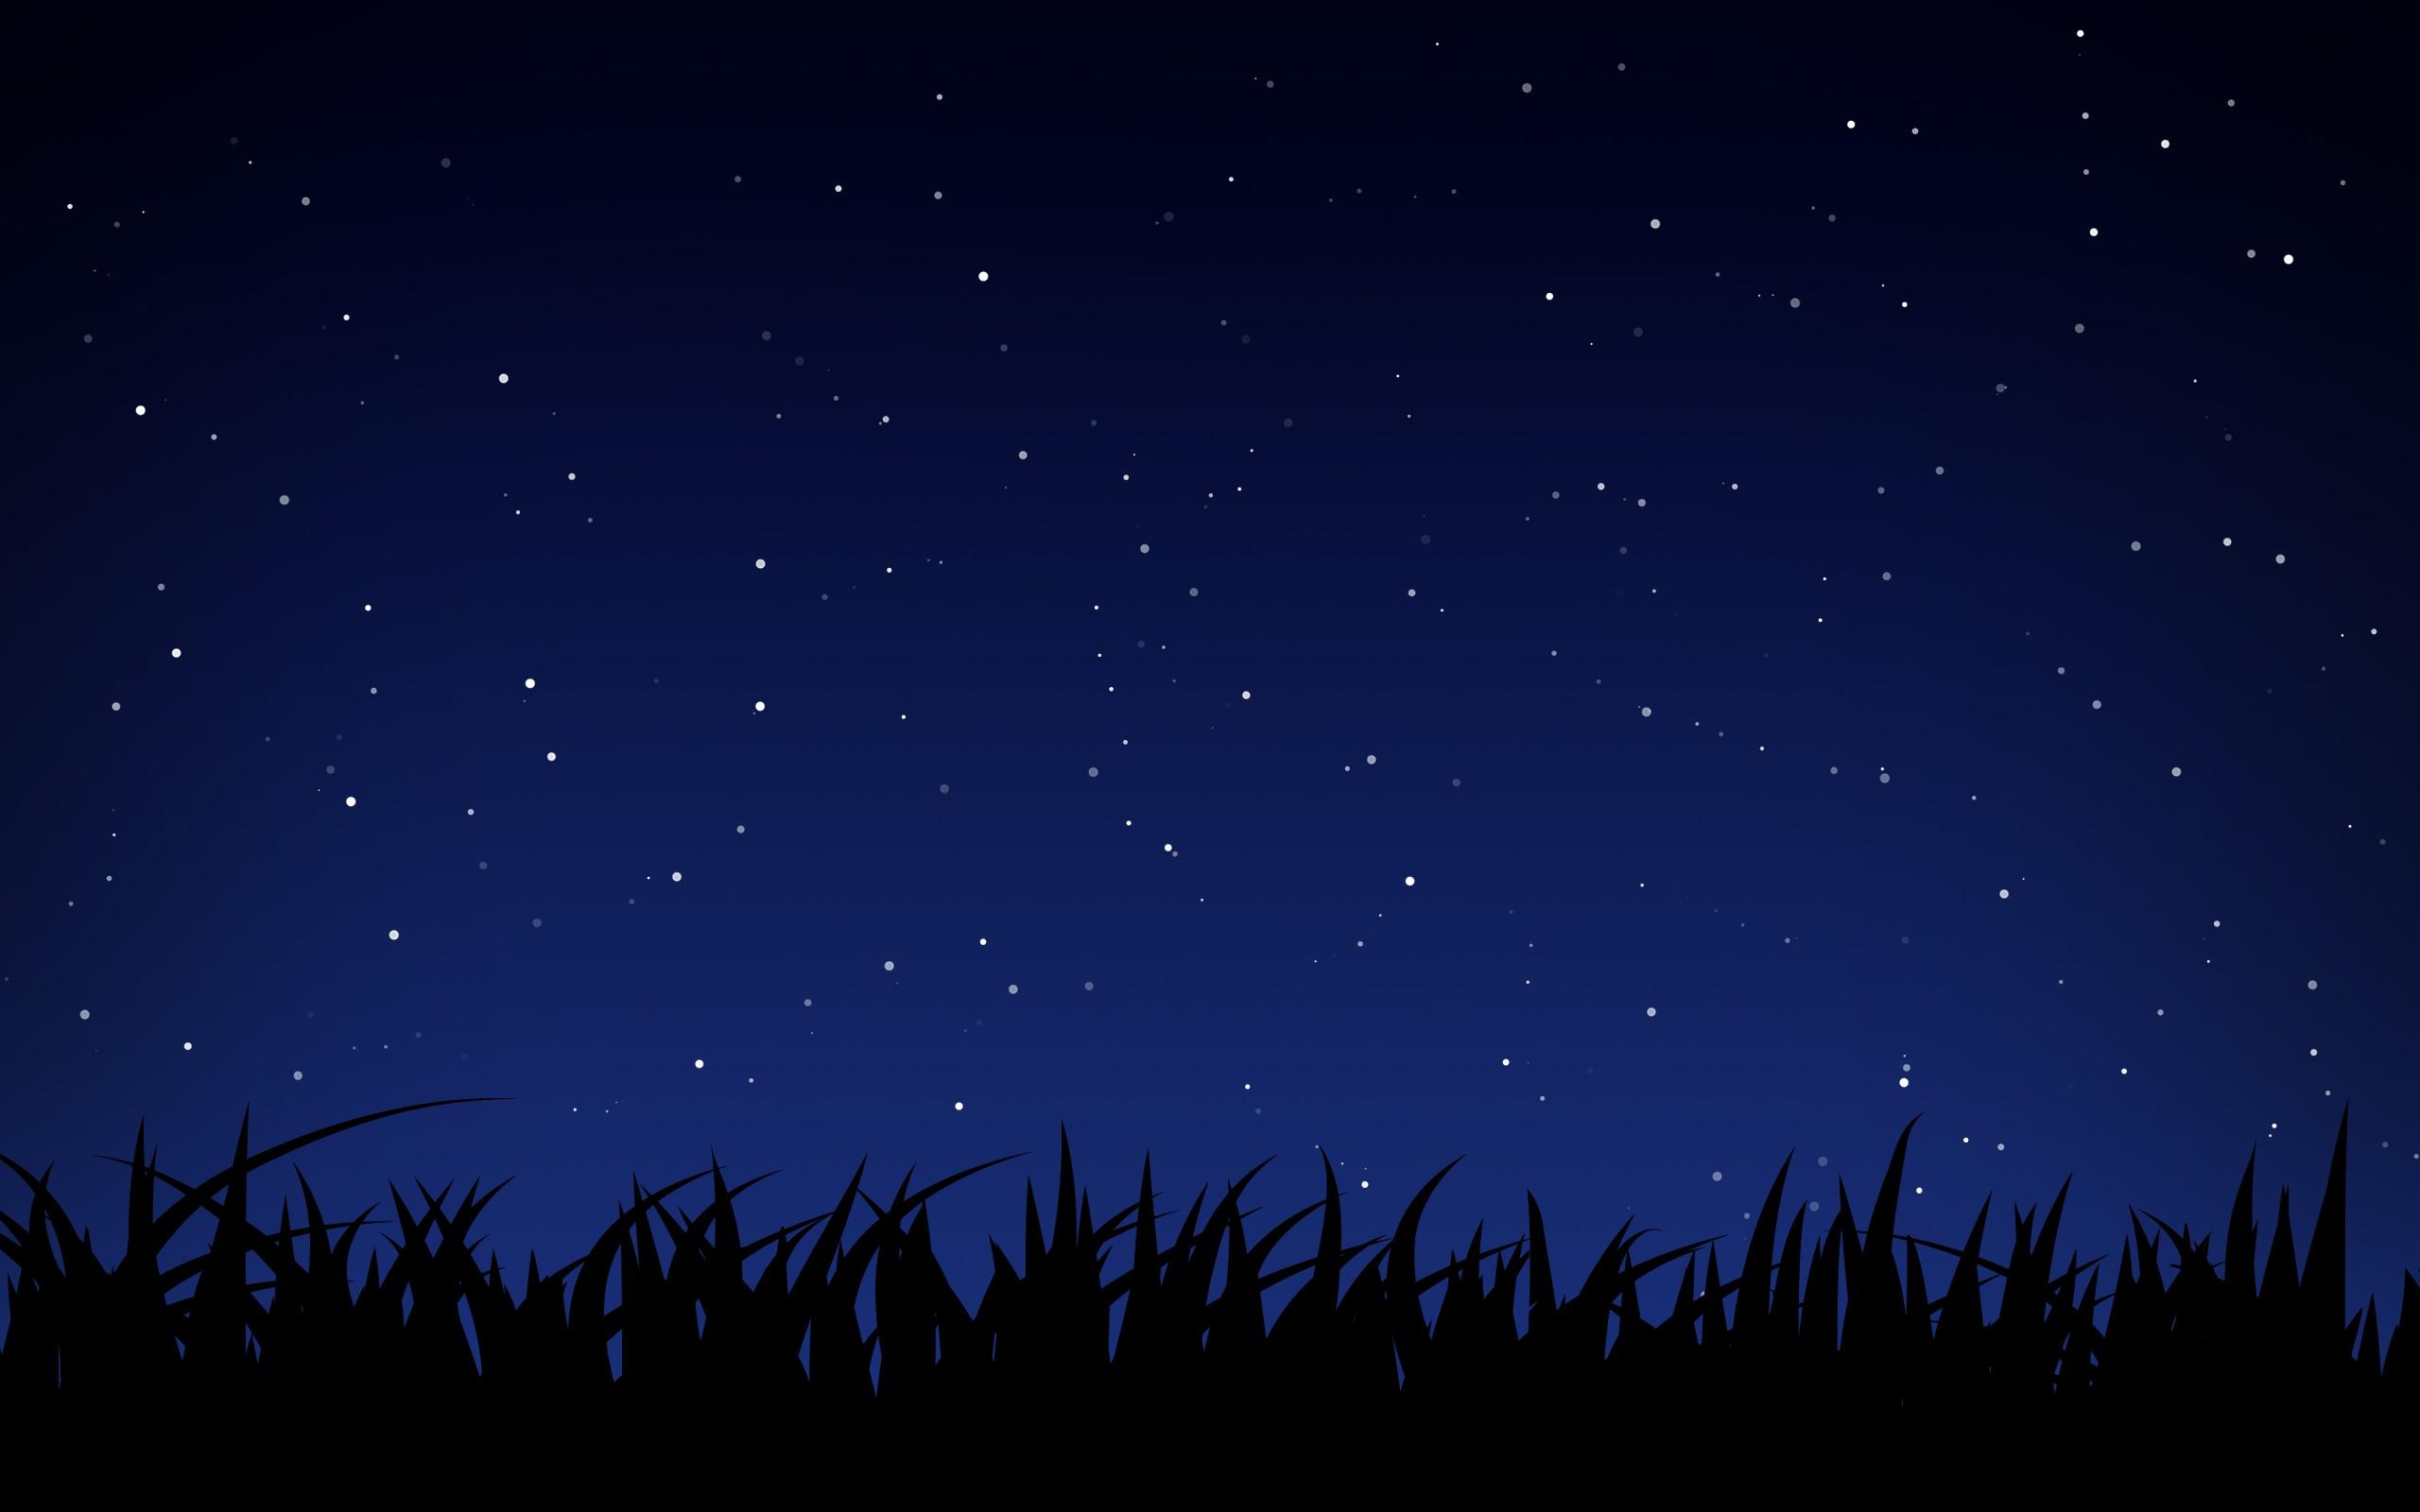 70 Starry Night Sky Wallpaper On Wallpapersafari